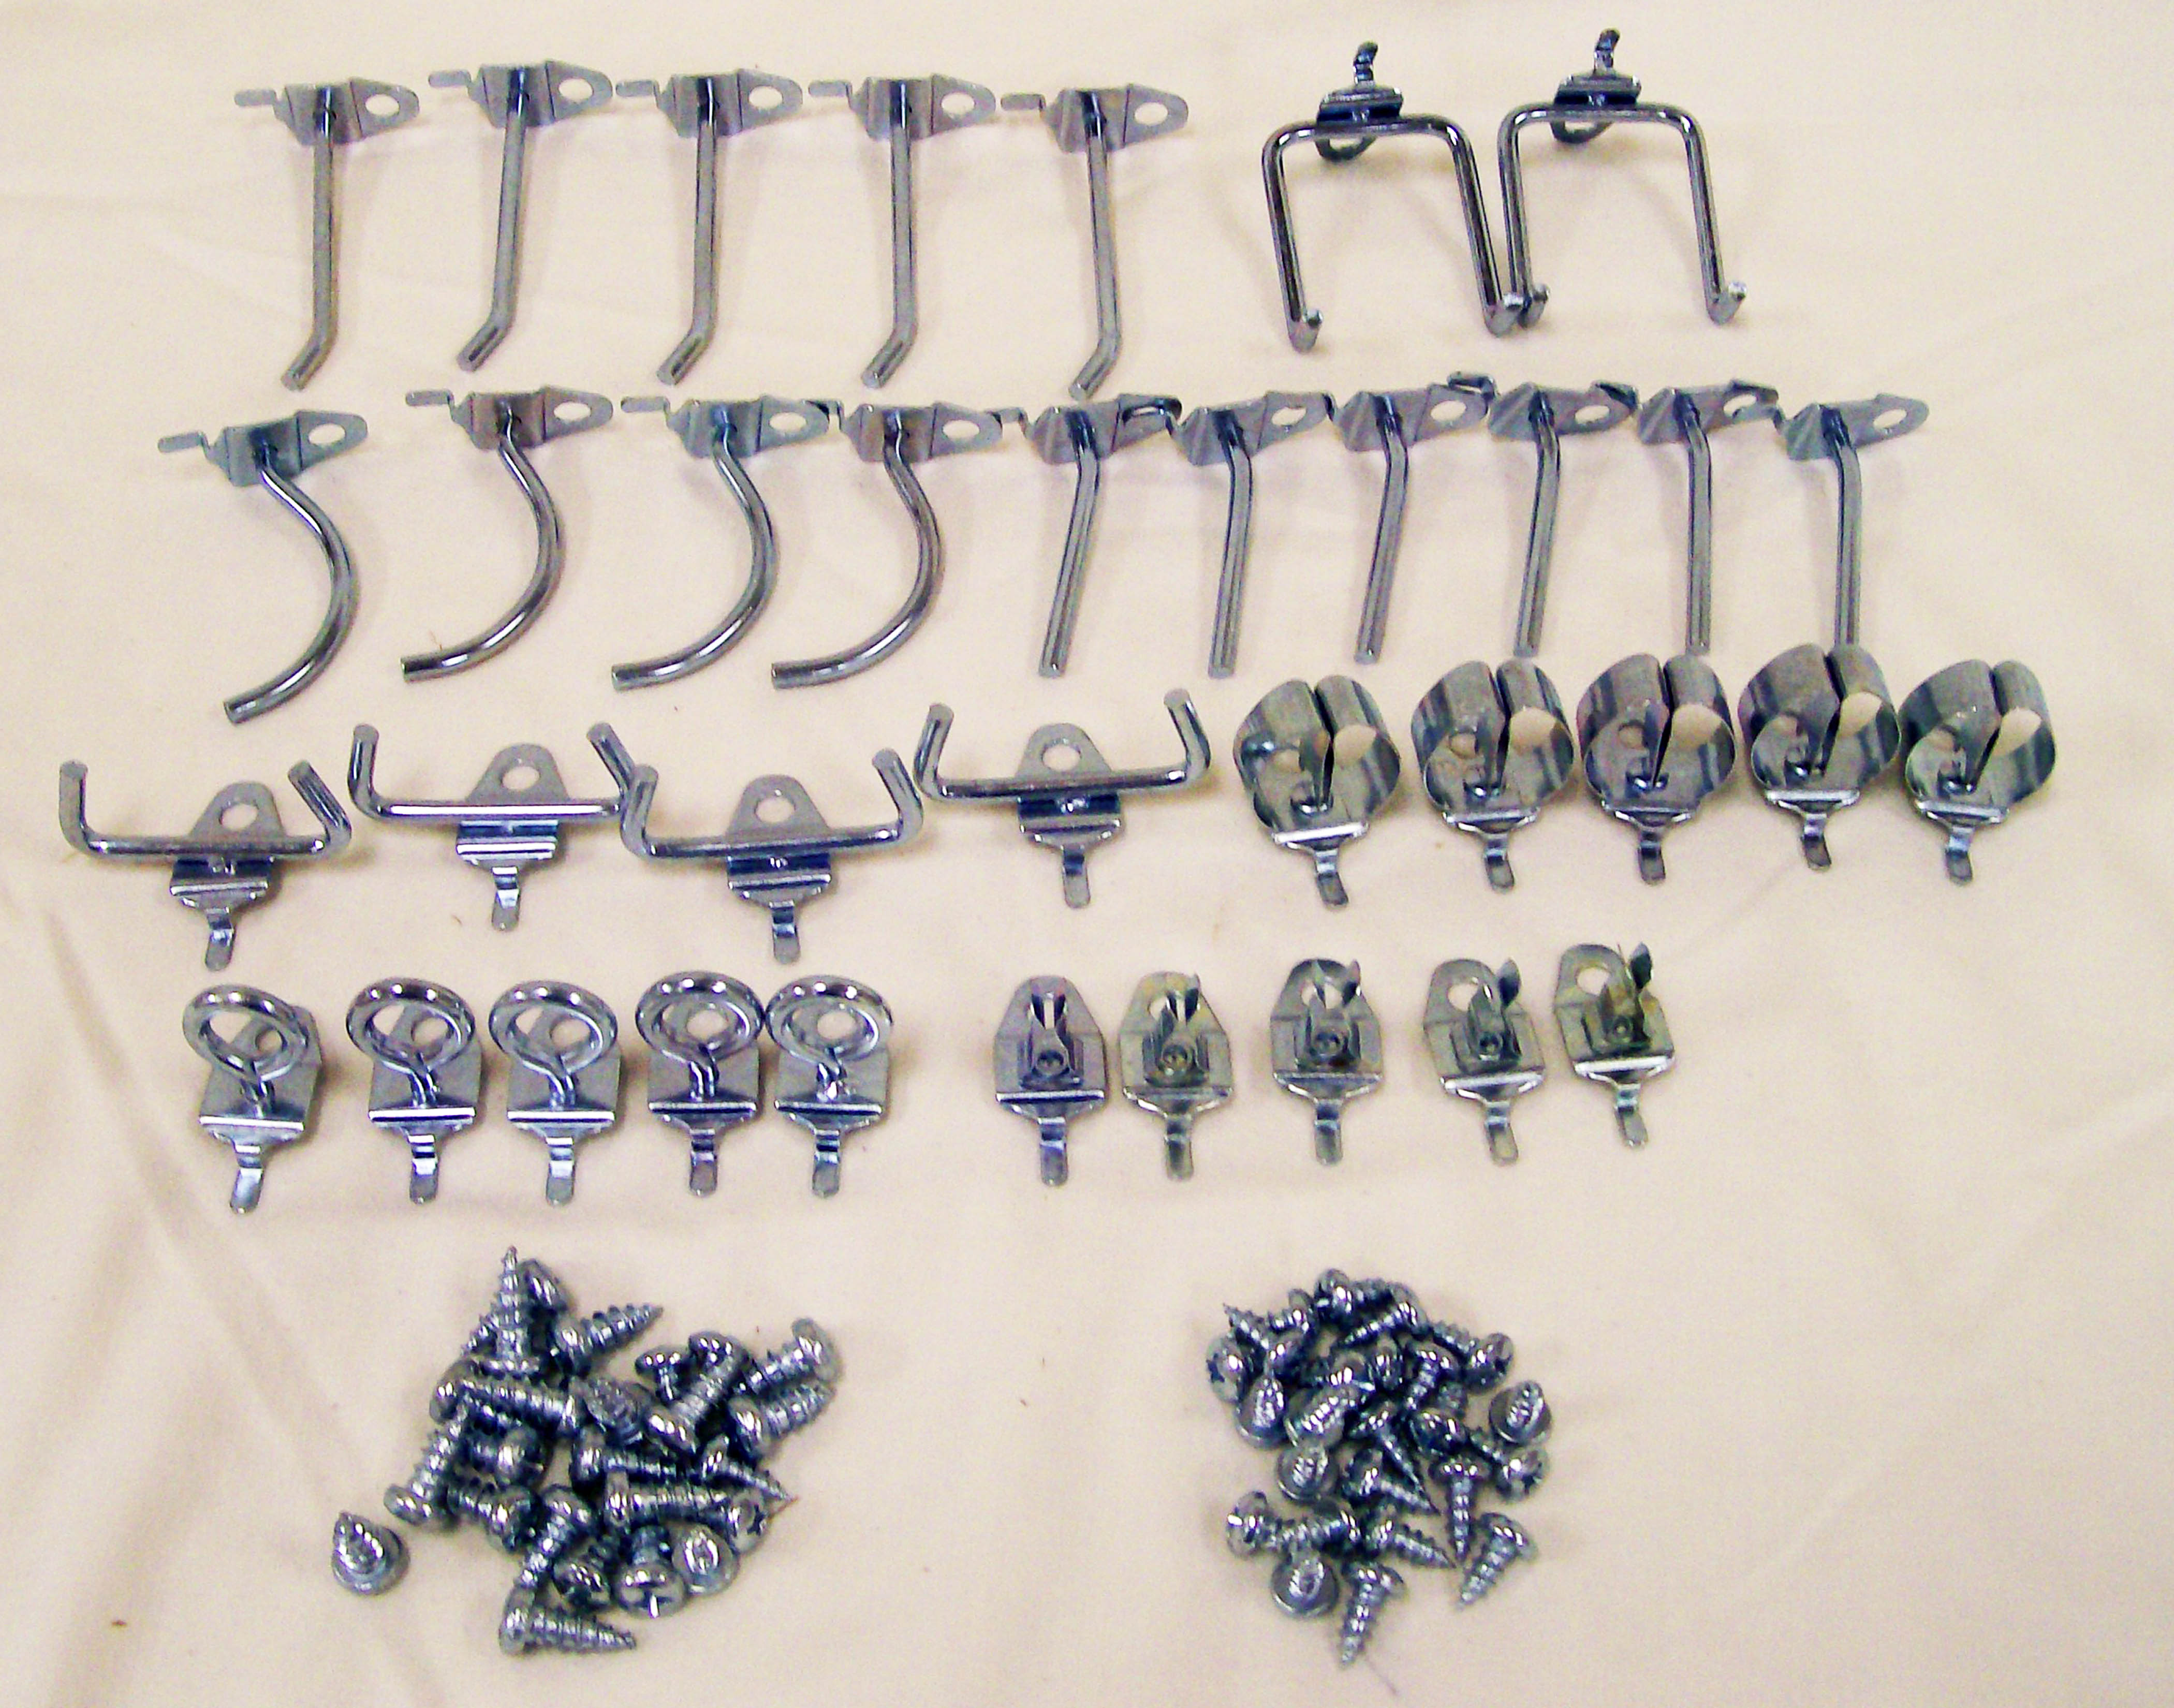 Epoxy-coated Steel Pegboard Shelf with Hooks - Thumbnail 1